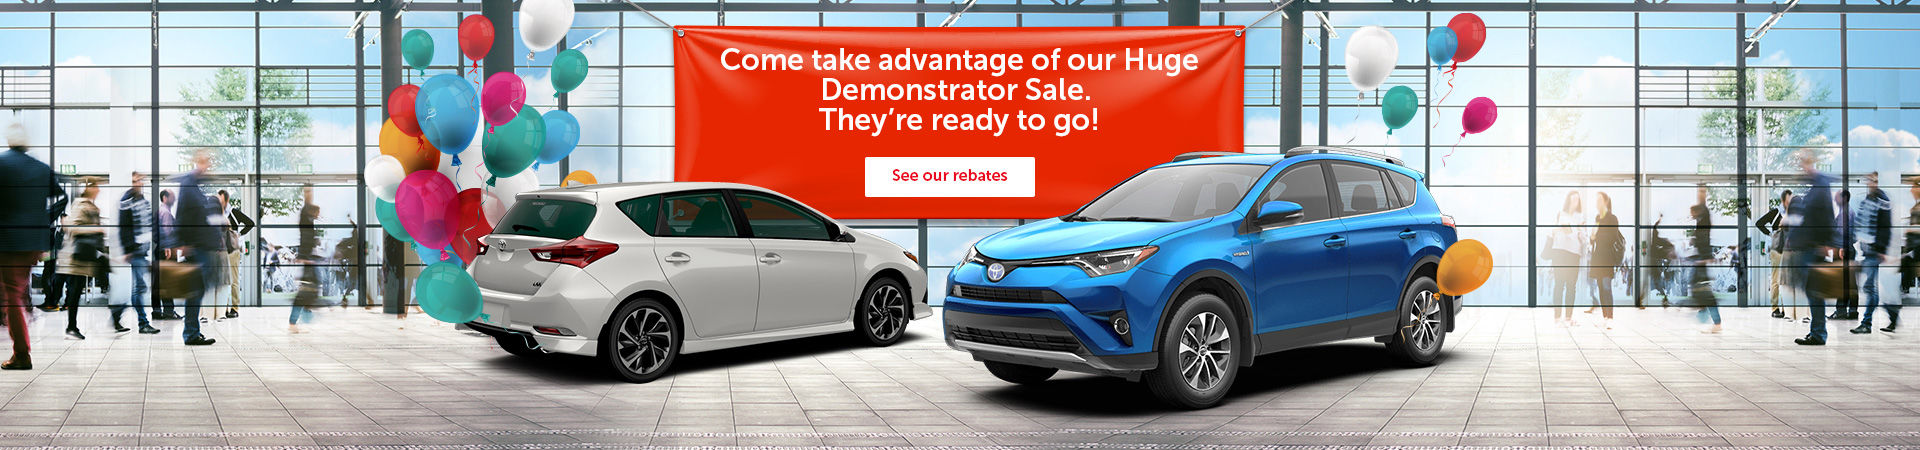 Huge Demonstrator Sale